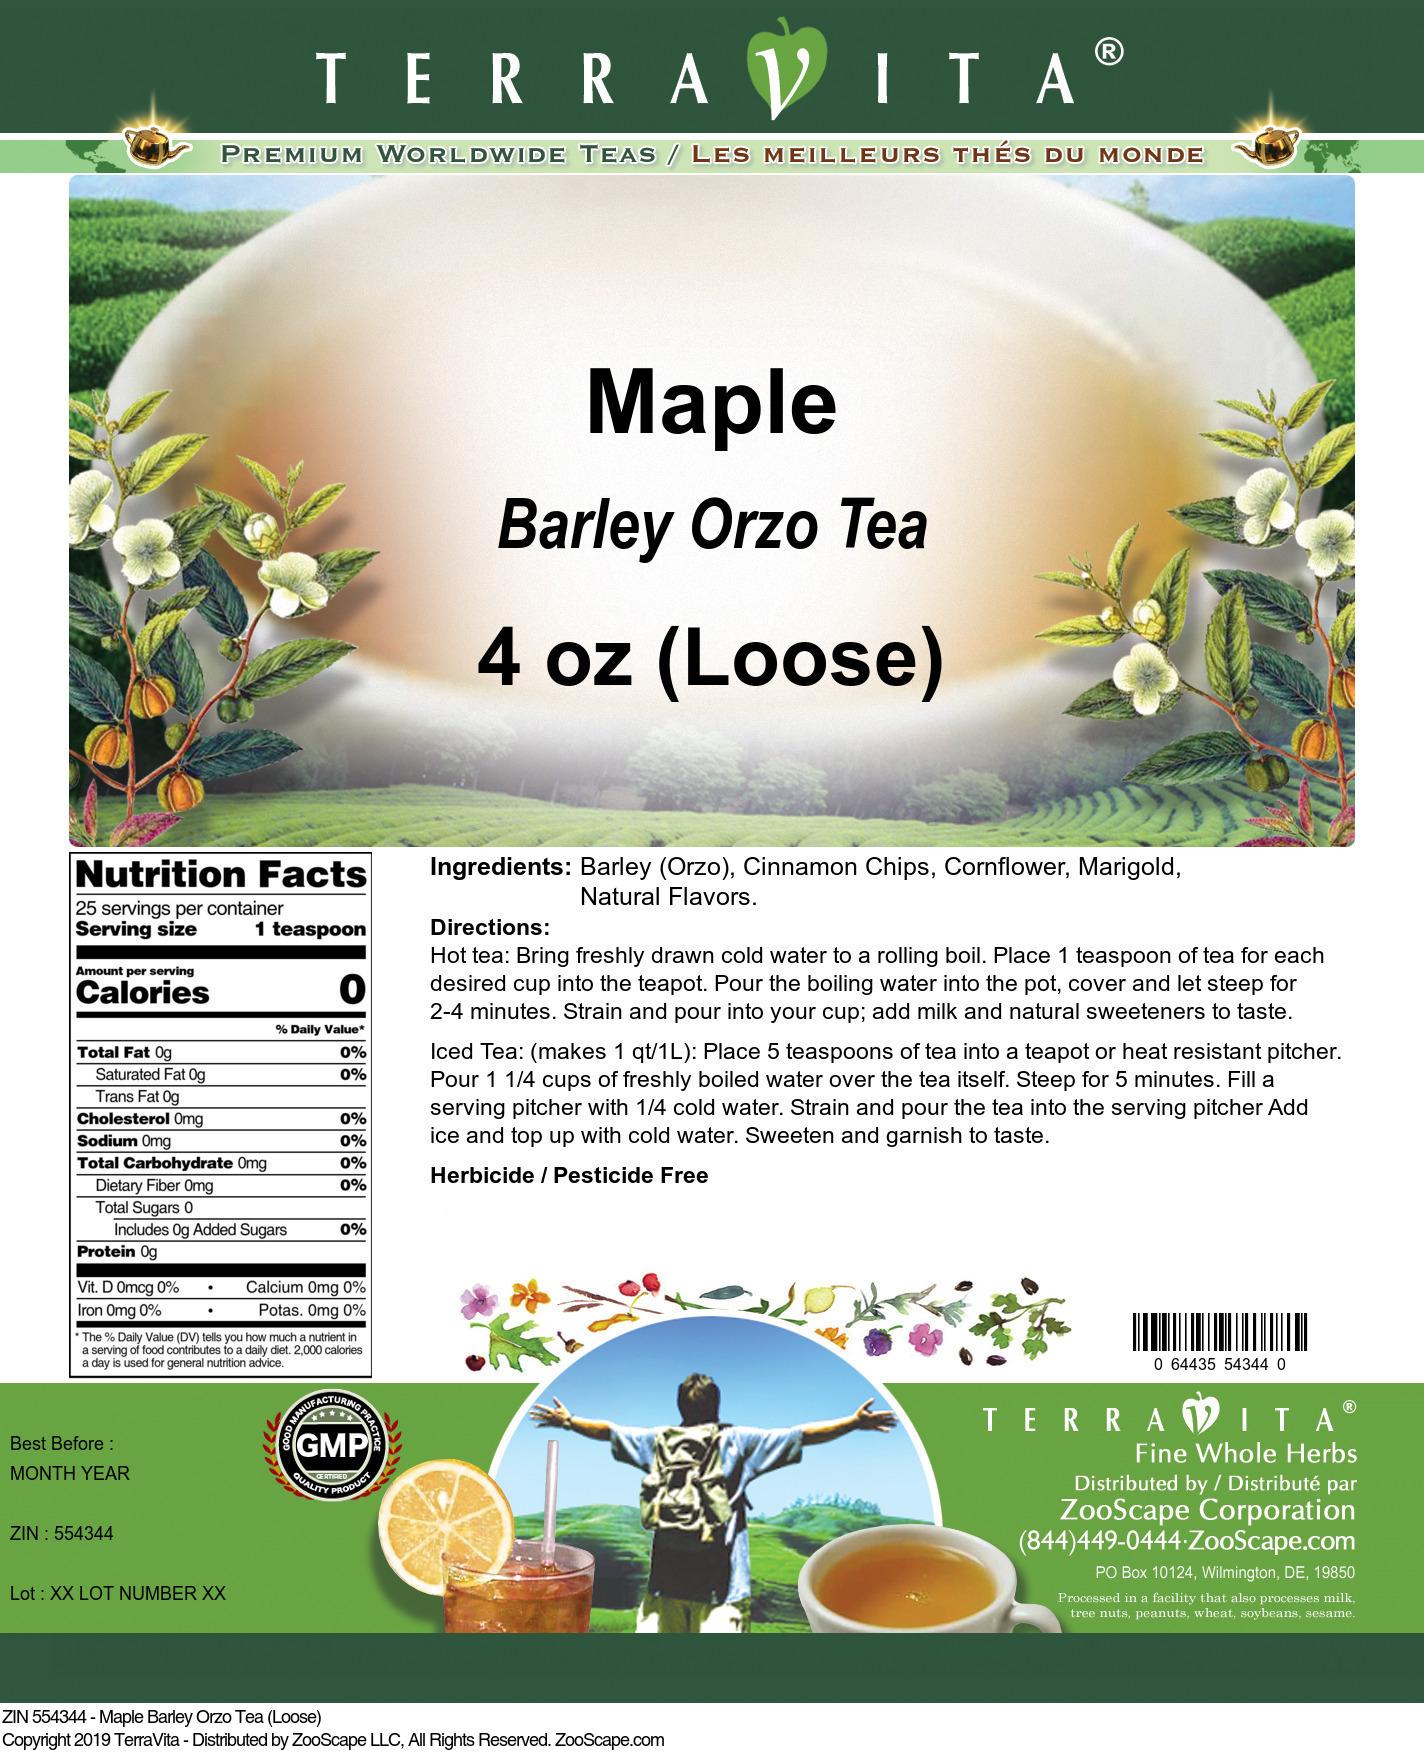 Maple Barley Orzo Tea (Loose)